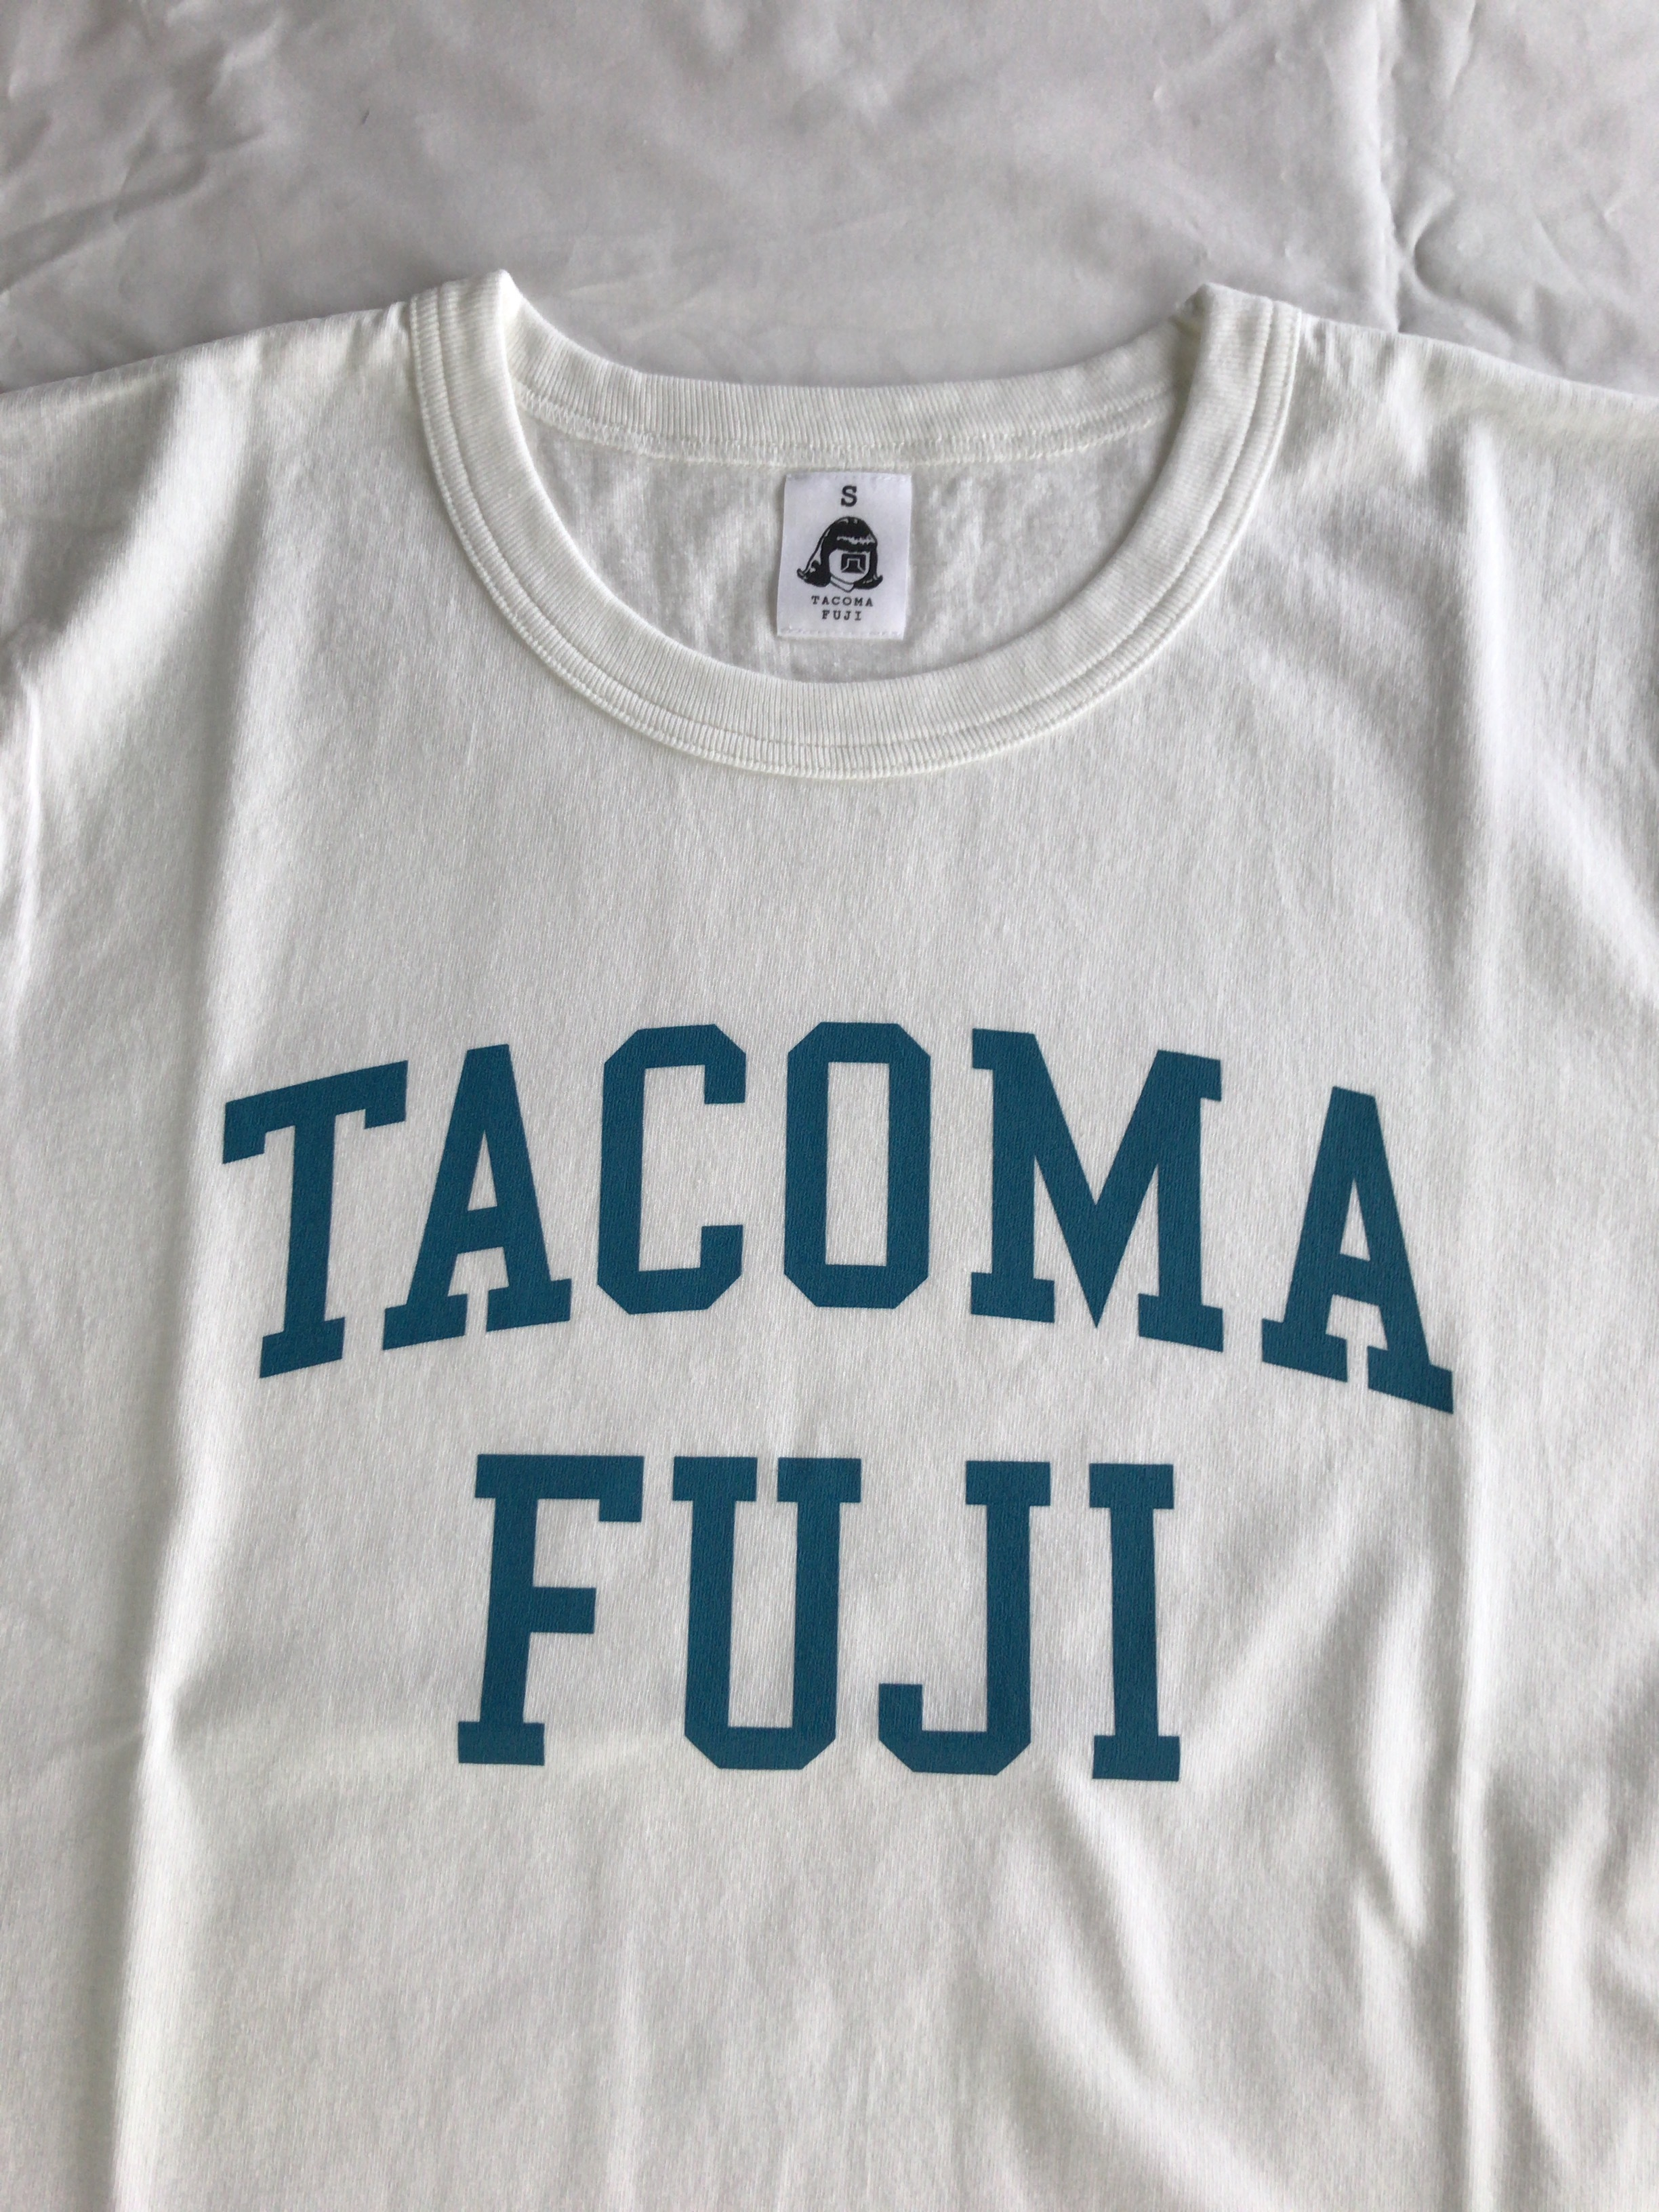 TACOMA FUJI RECORDS COLLGE LOGO  designed by Shuntaro Watanabe  WHITE